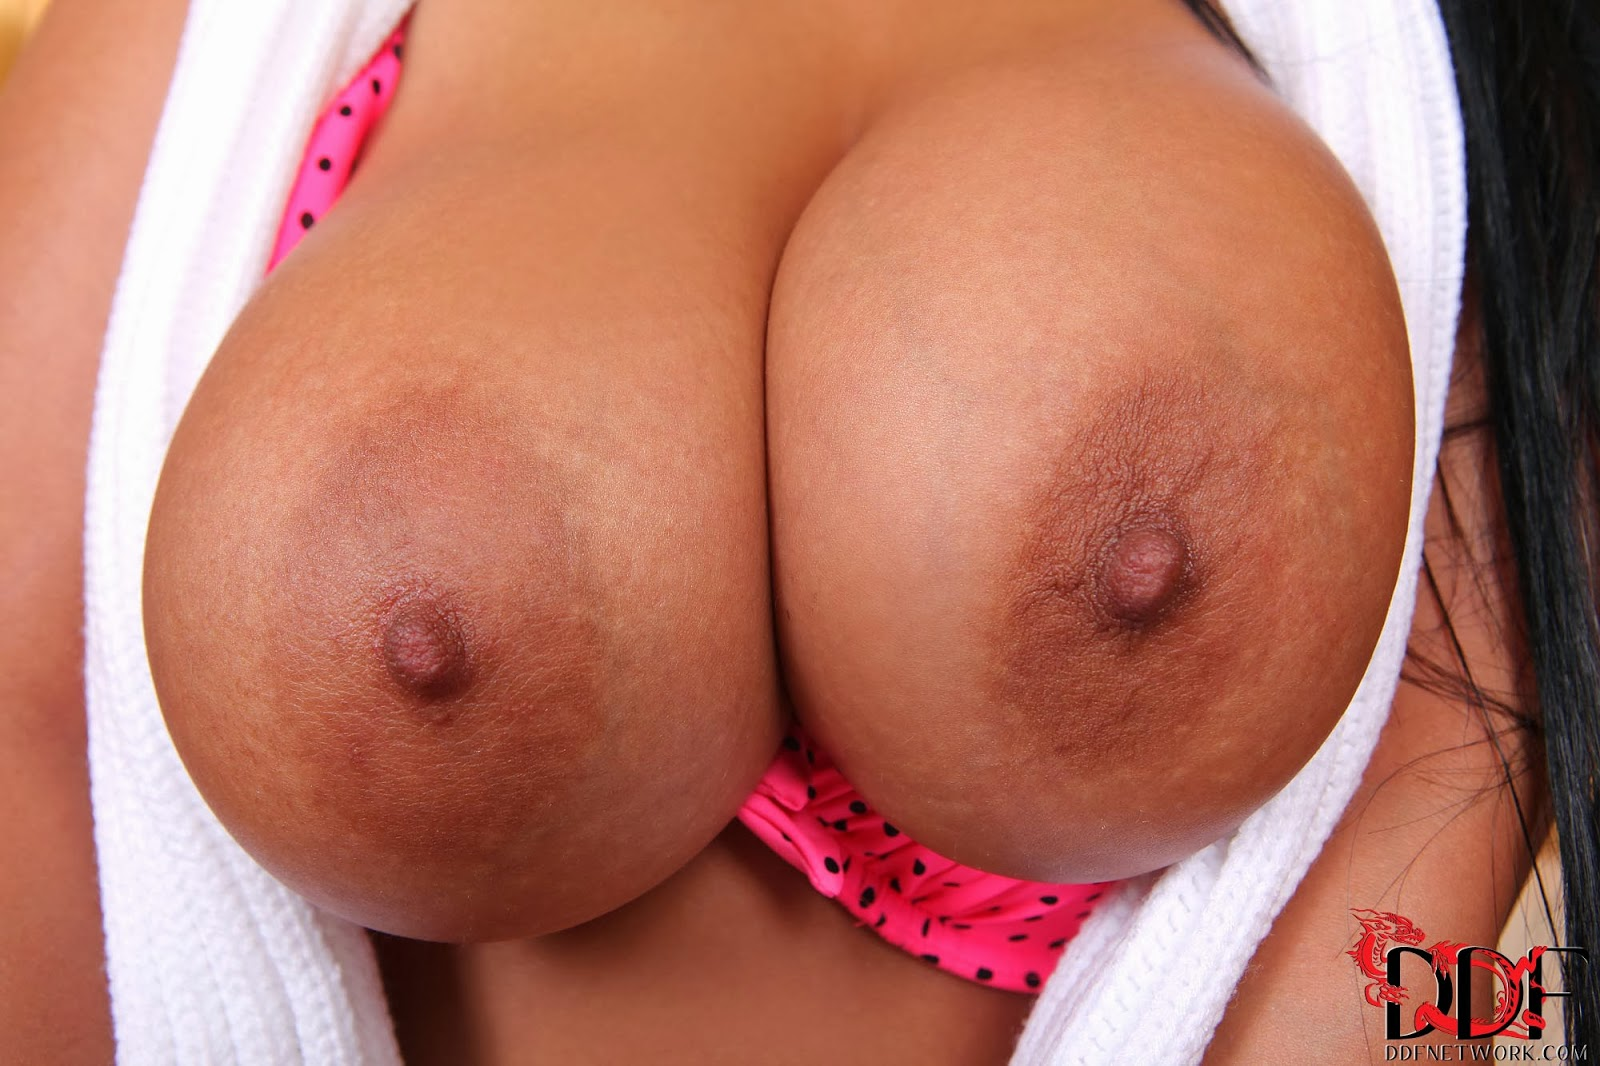 Huge busted natural boob images